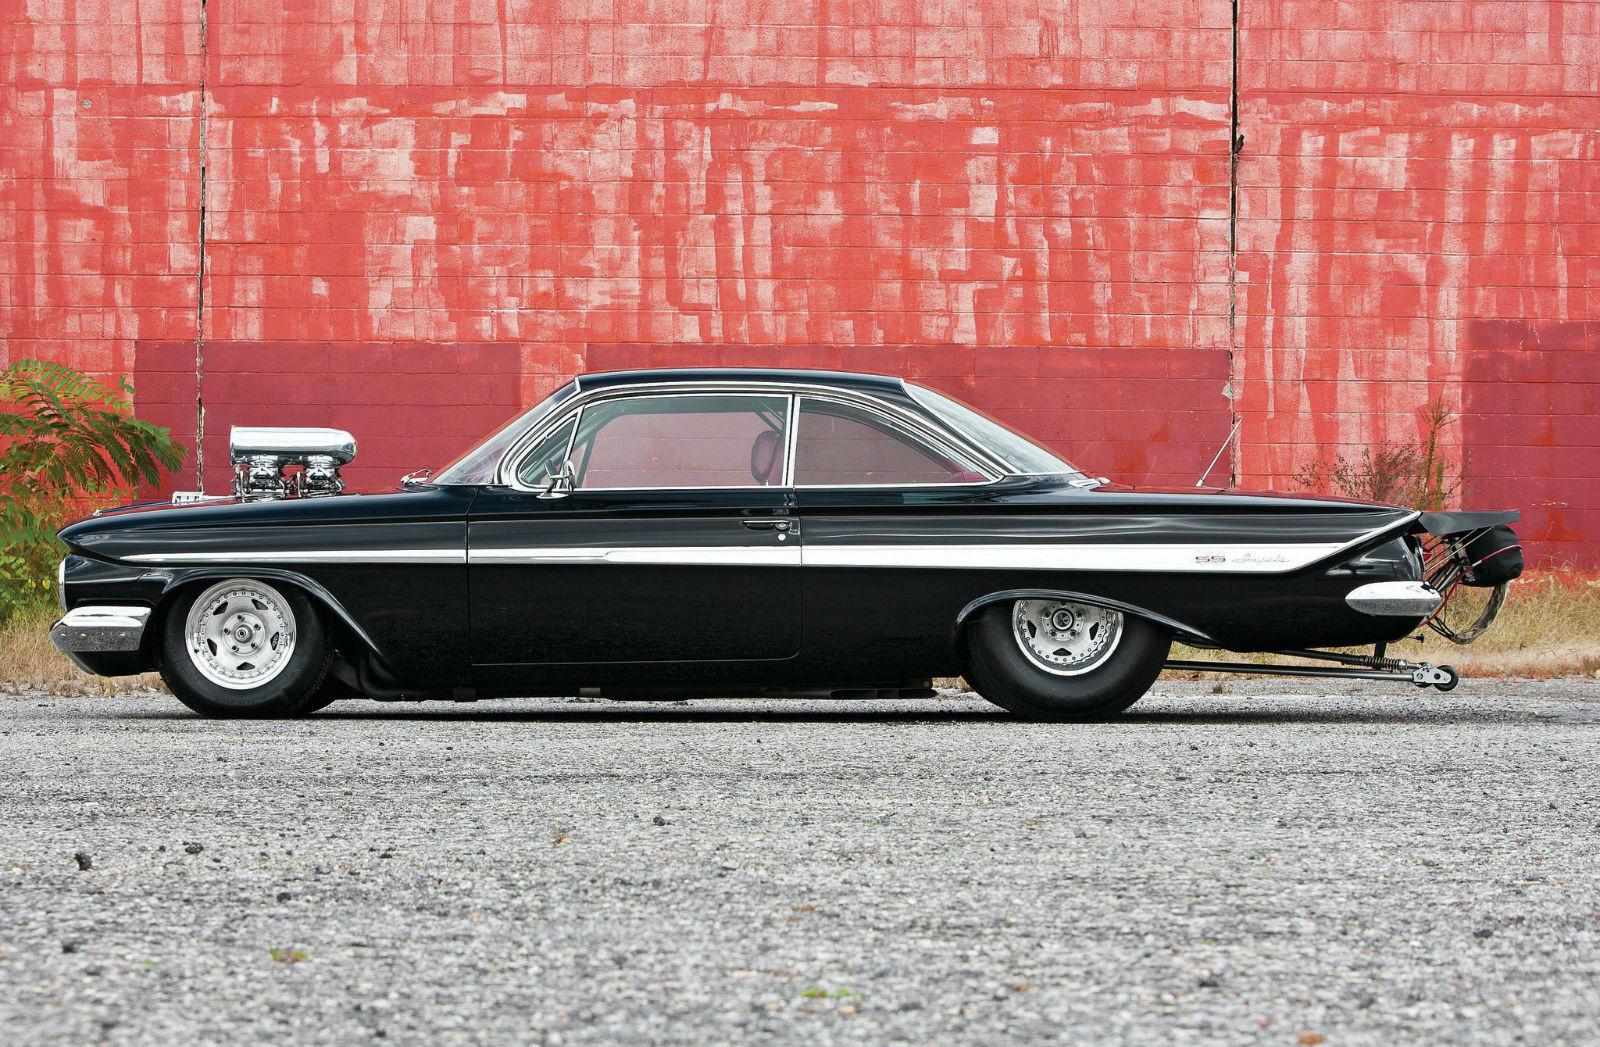 1961-chevrolet-impala-side-view